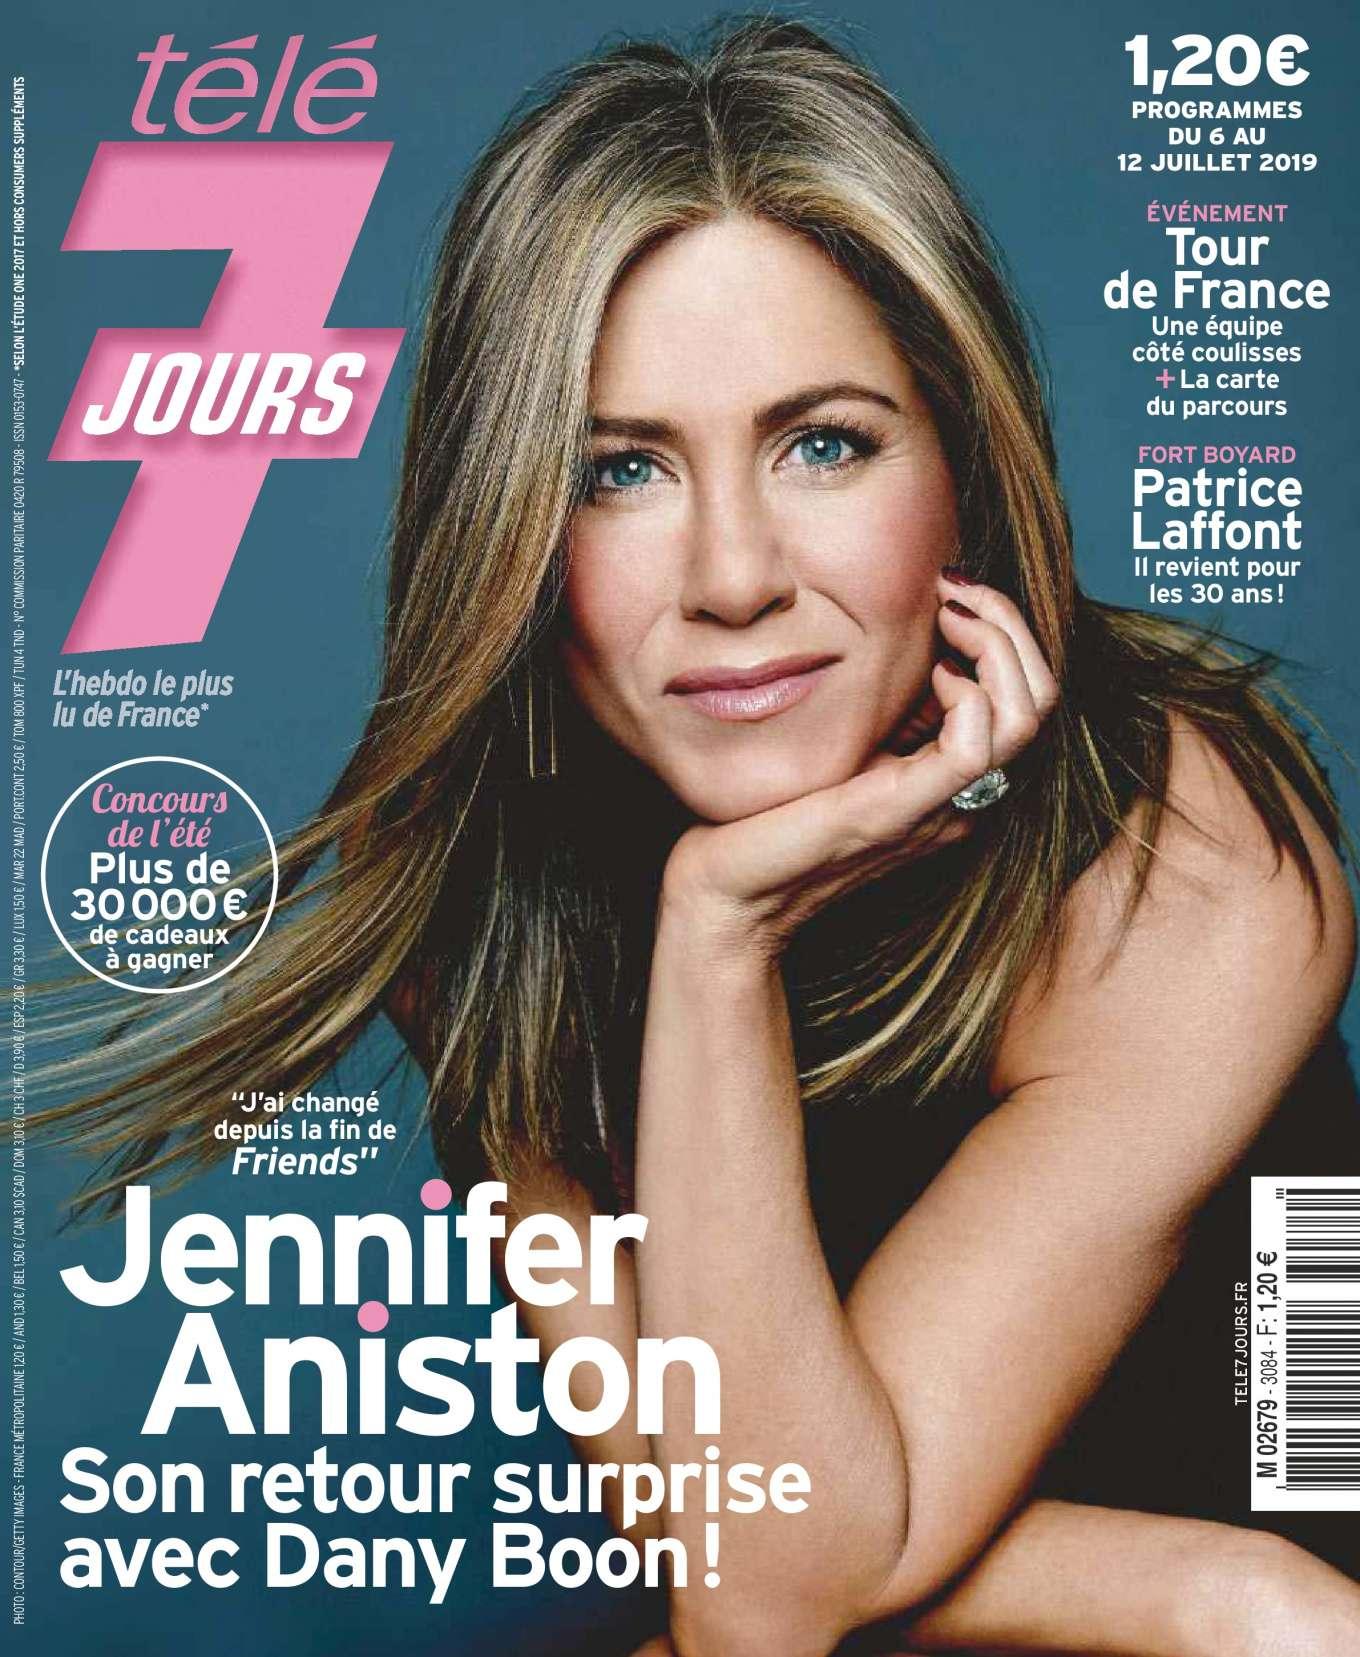 El secreto tras los ojos de Jennifer Aniston - StyleLovely